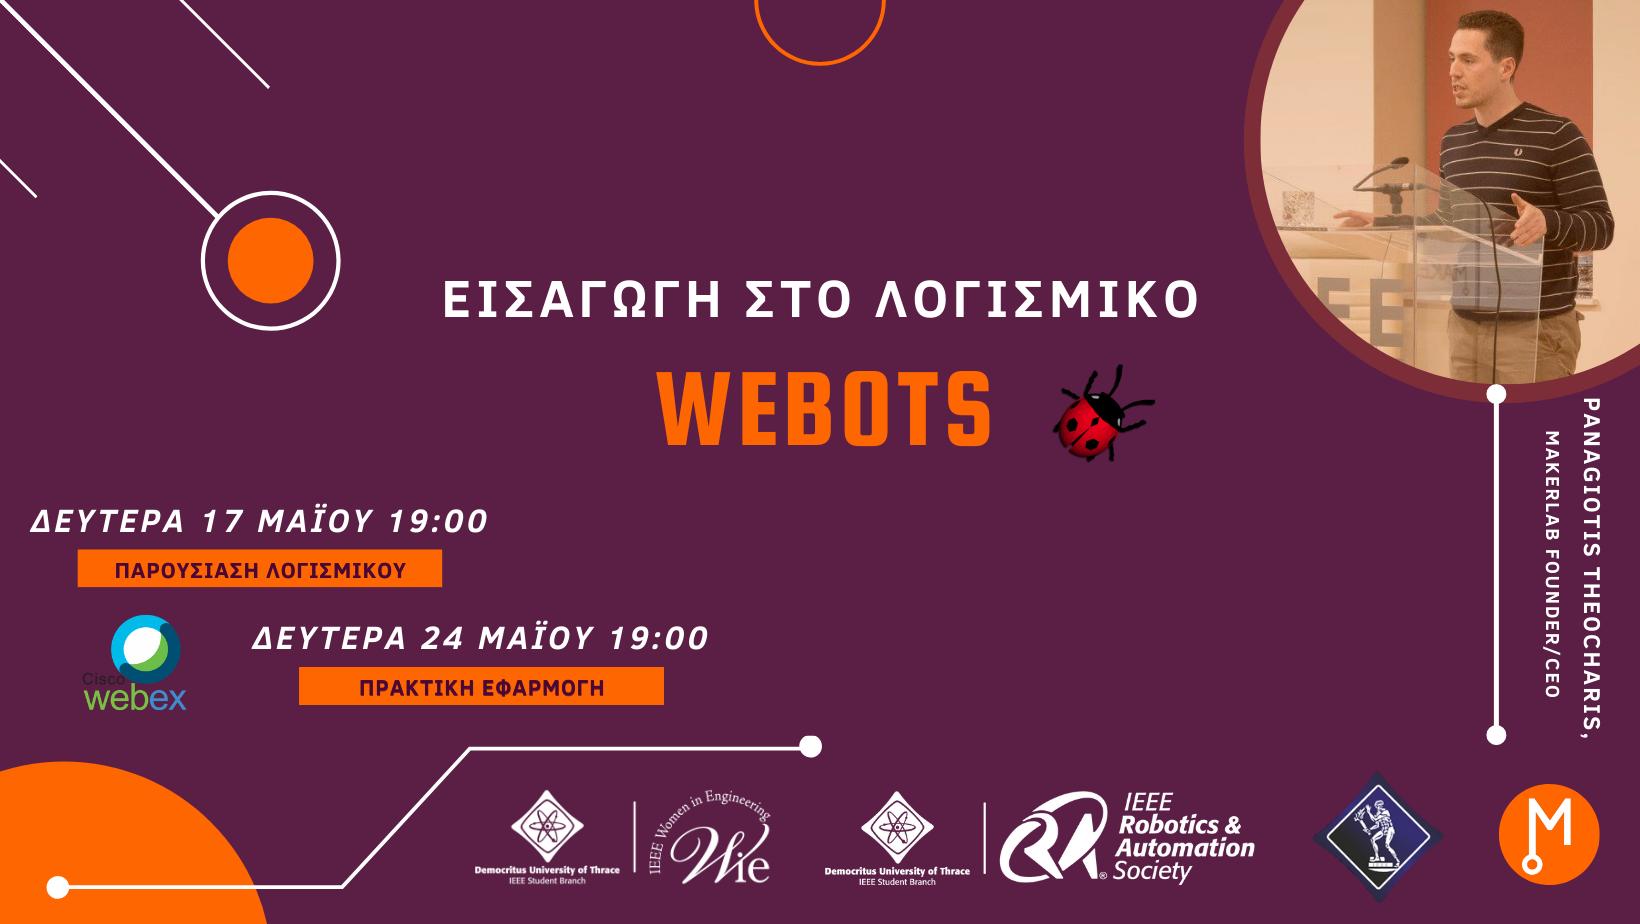 Workshop για το λογισμικό Webots από το Τμήμα Ηλεκτρολόγων Μηχανικών